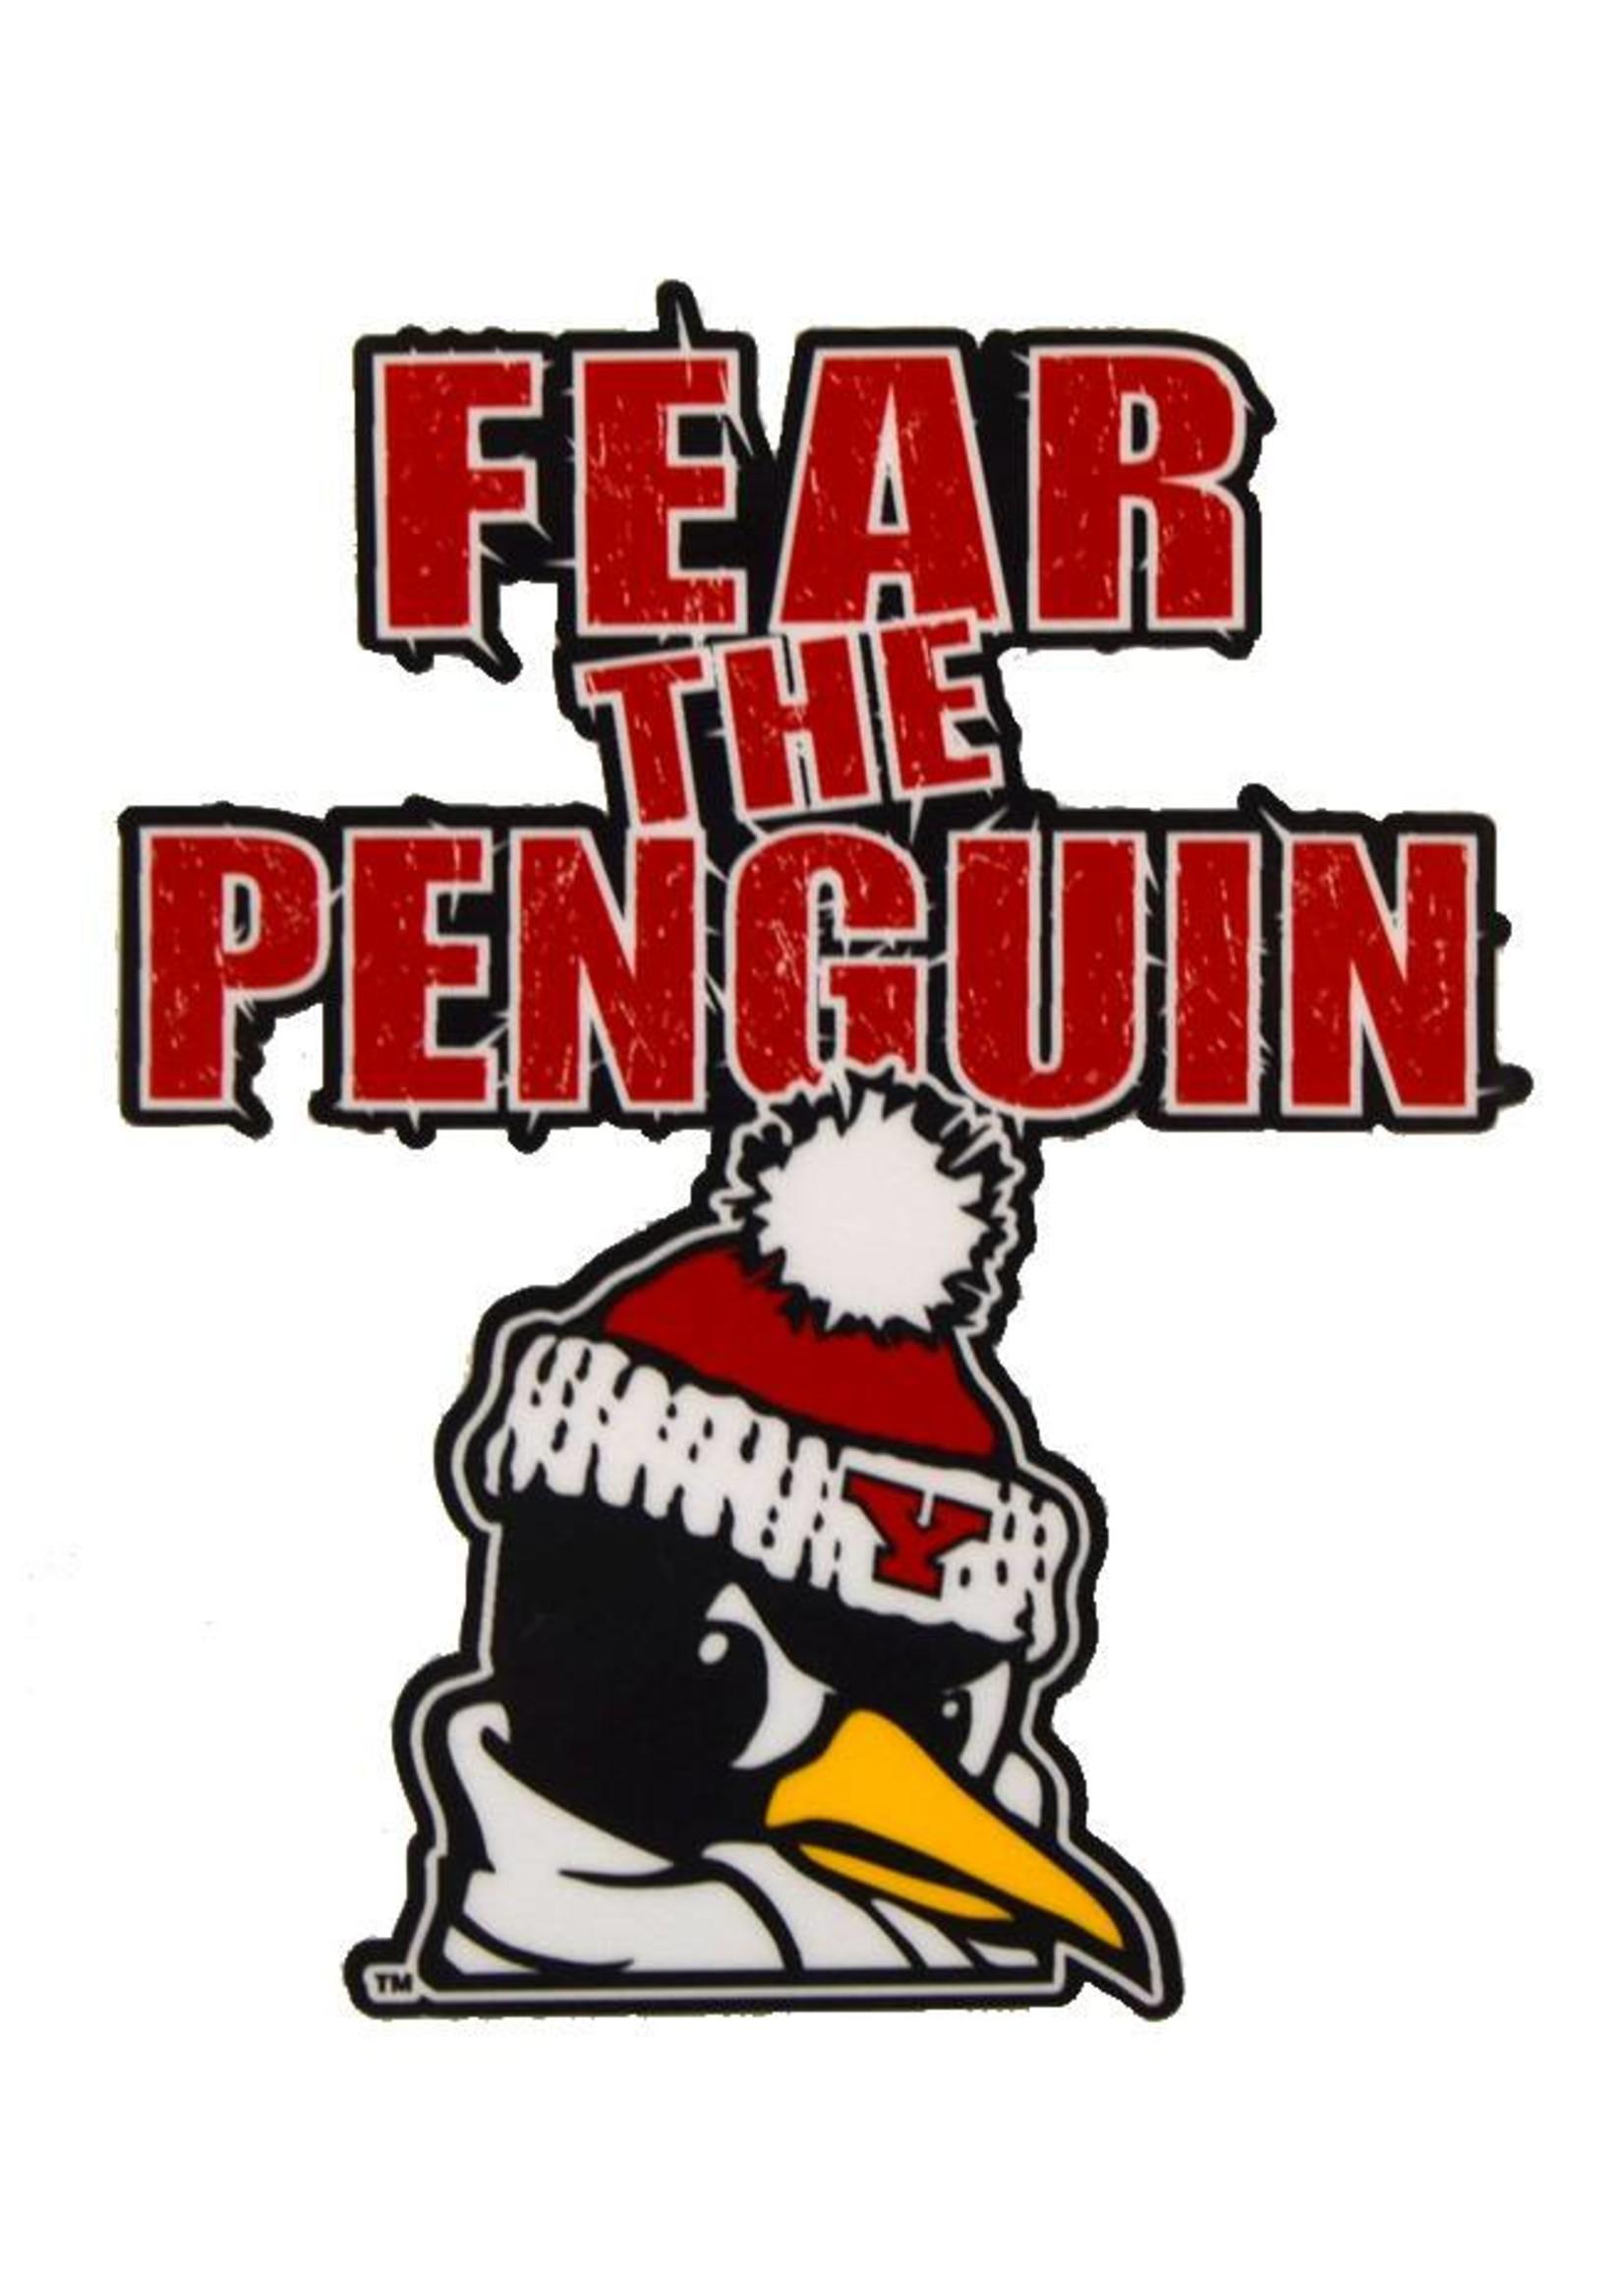 YSU Fear the Penguin 4x4 Decal